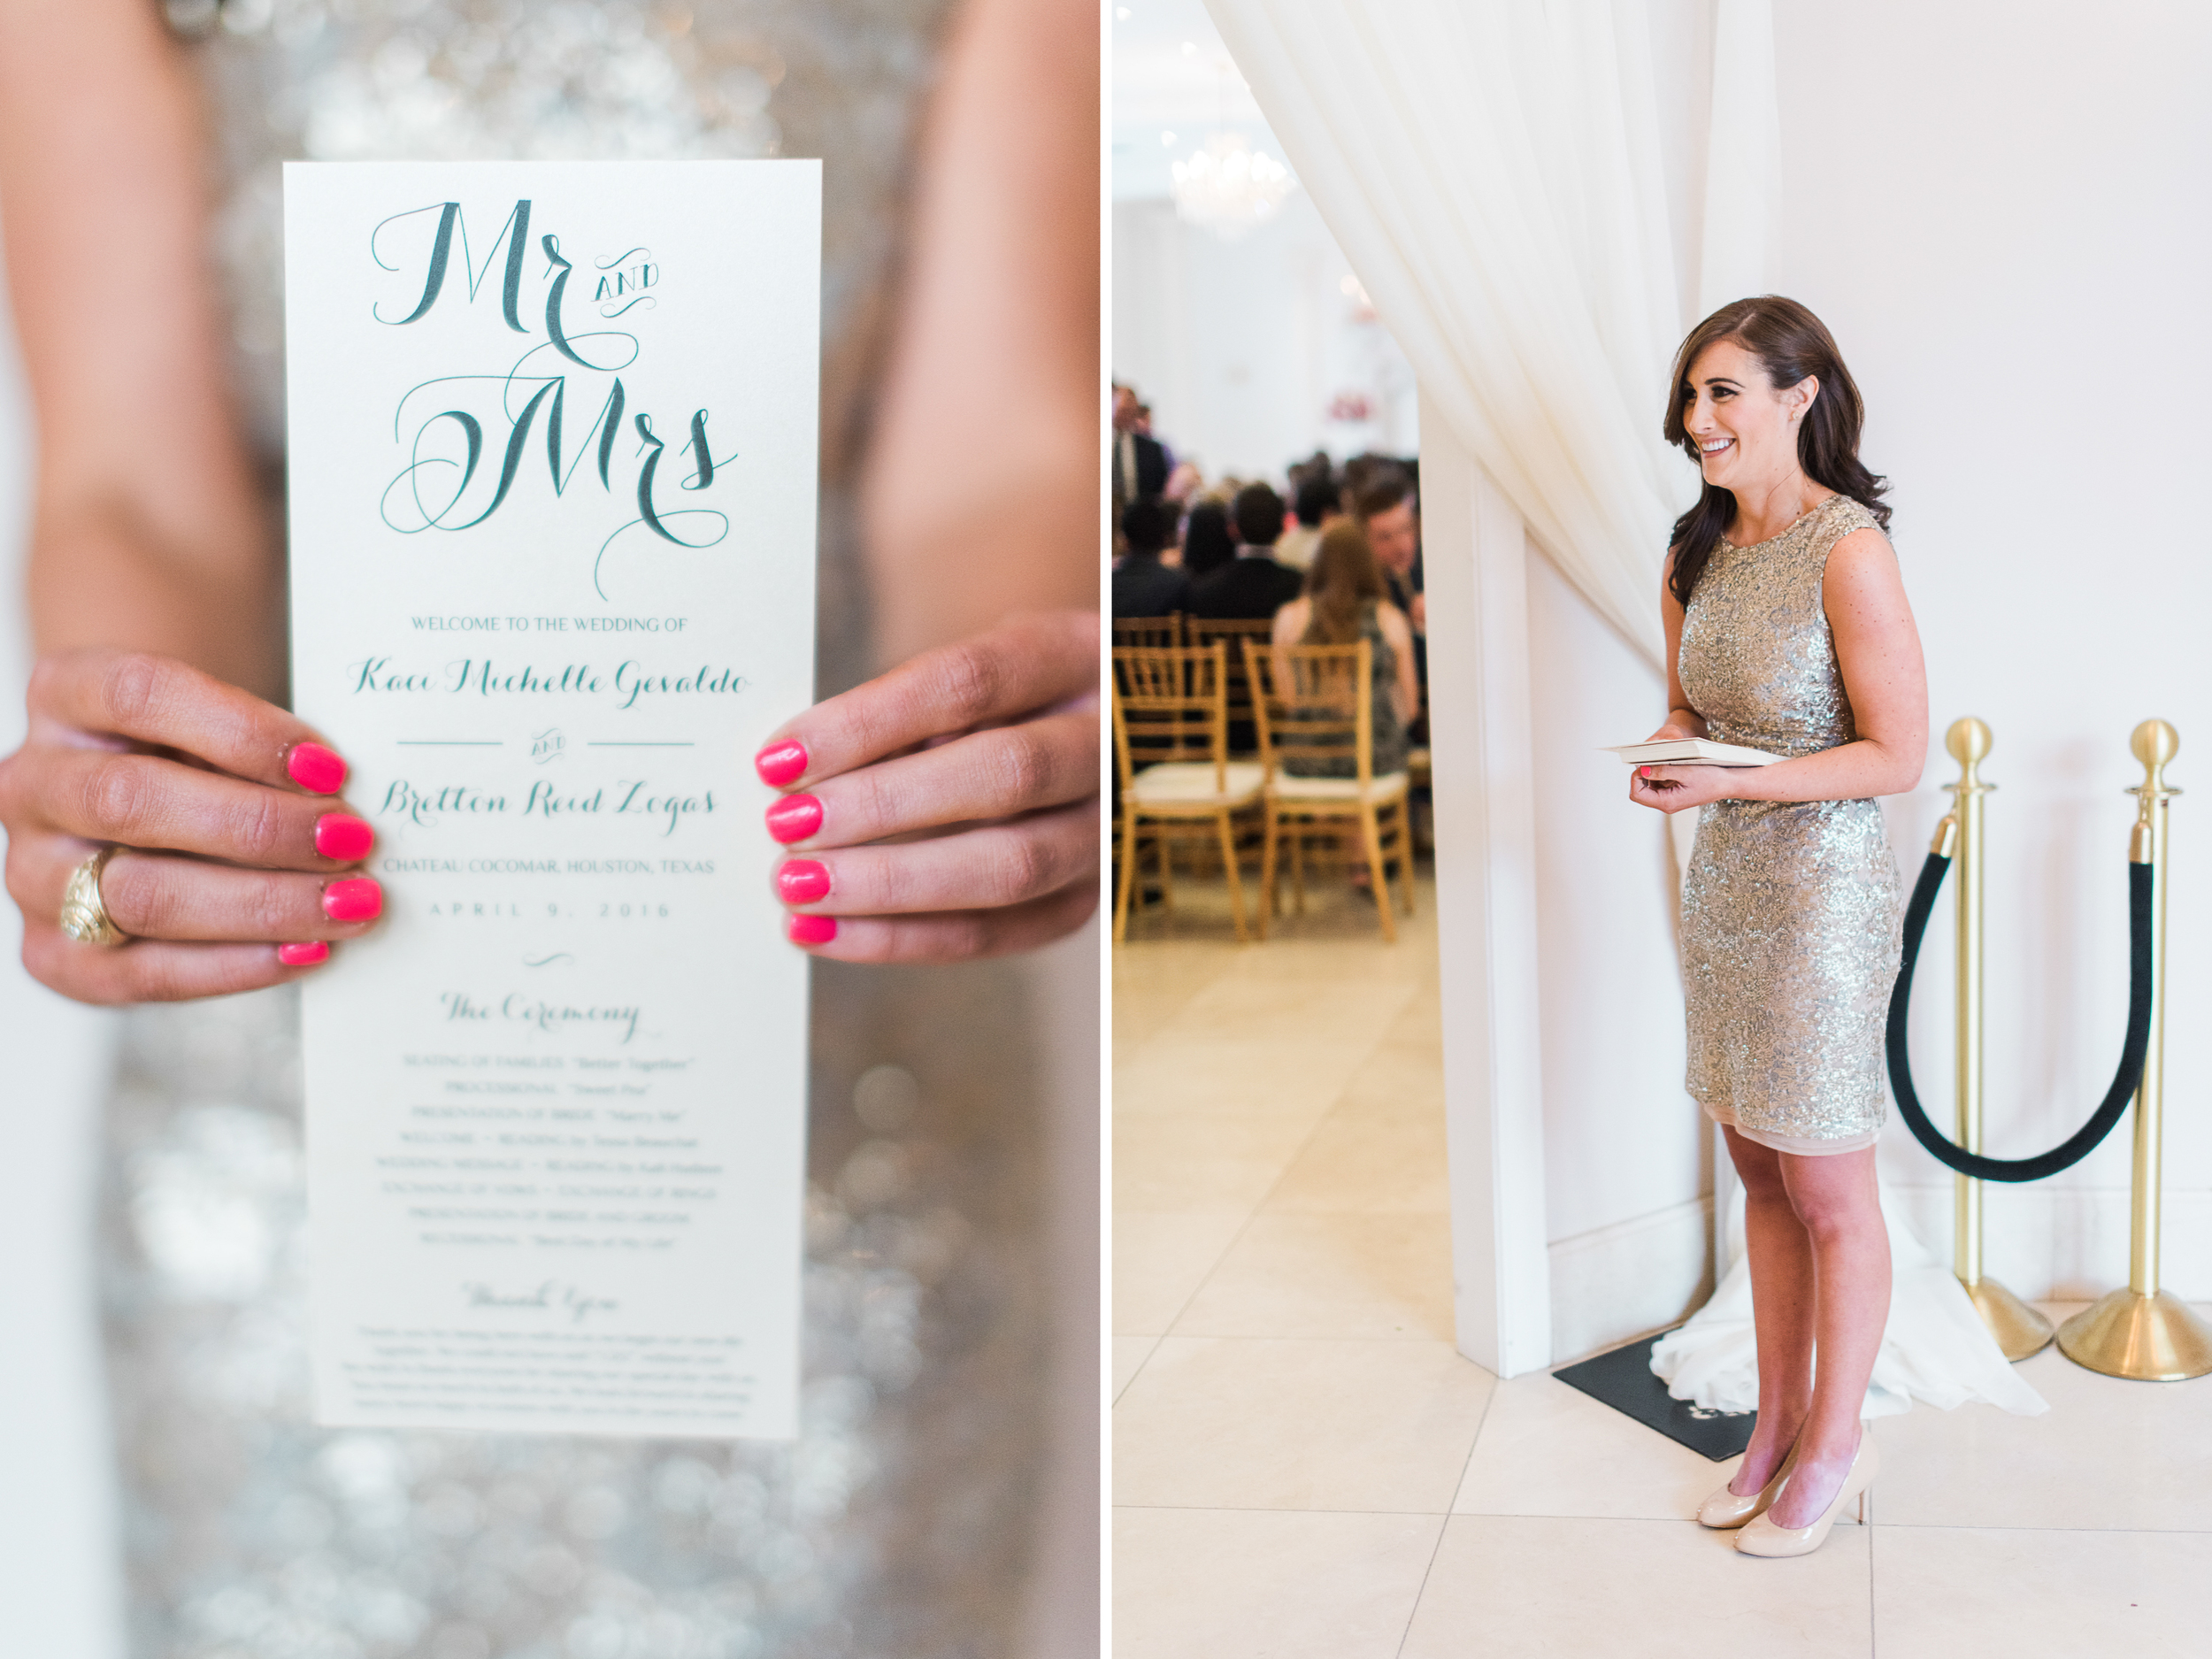 Dana-Fernandez-Photography-Houston-Wedding-Photographer-Style-Me-Pretty-Film-Texas-Destination-Photographer-110.jpg